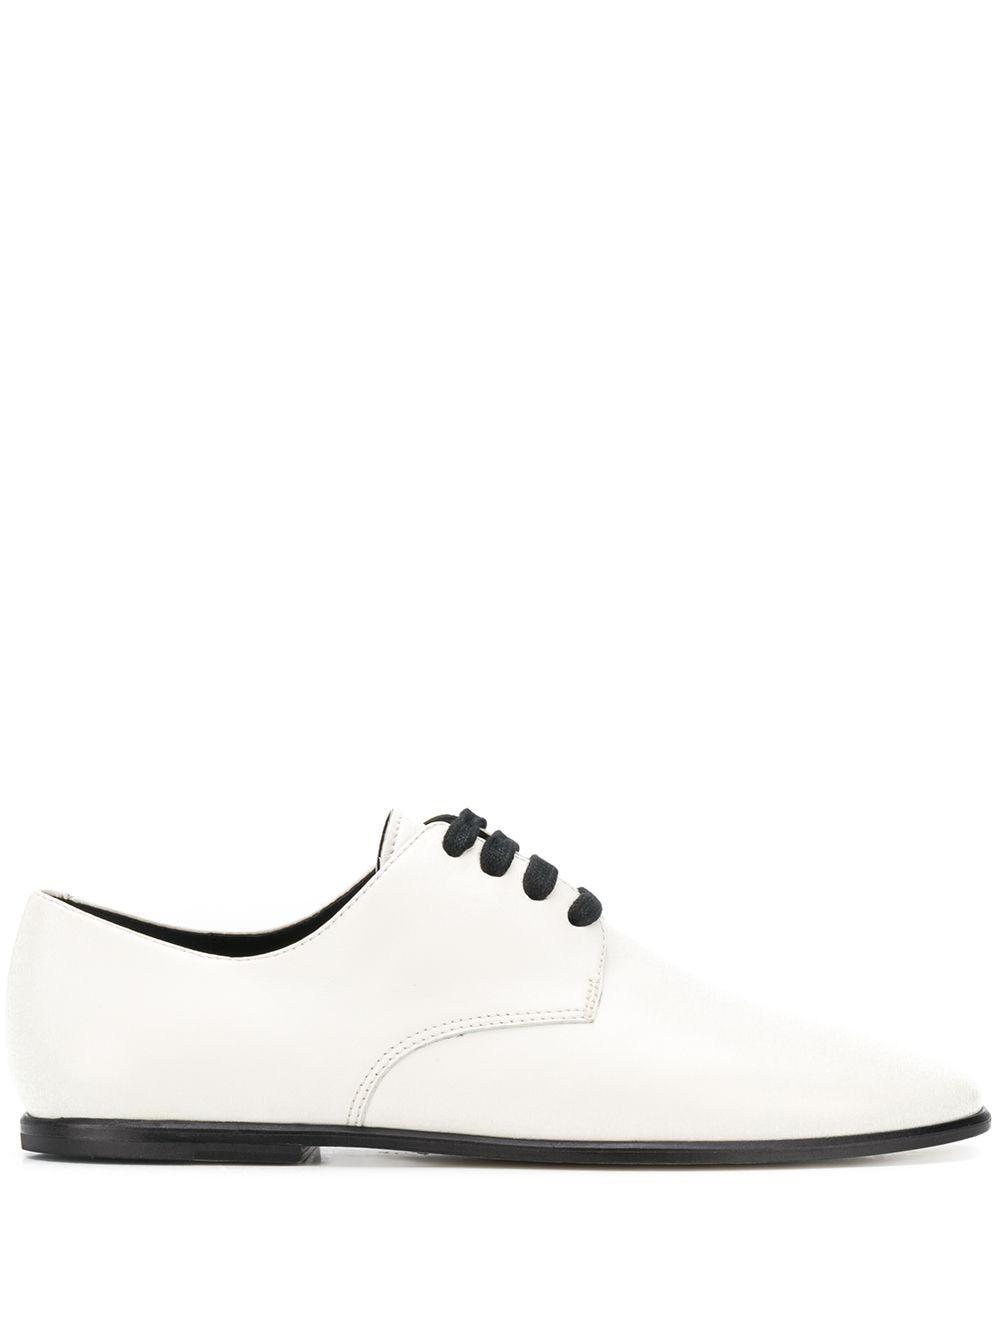 Camperlab Twins Derby Shoes Farfetch Derby Shoes Shoes White Dress Shoes [ 1334 x 1000 Pixel ]